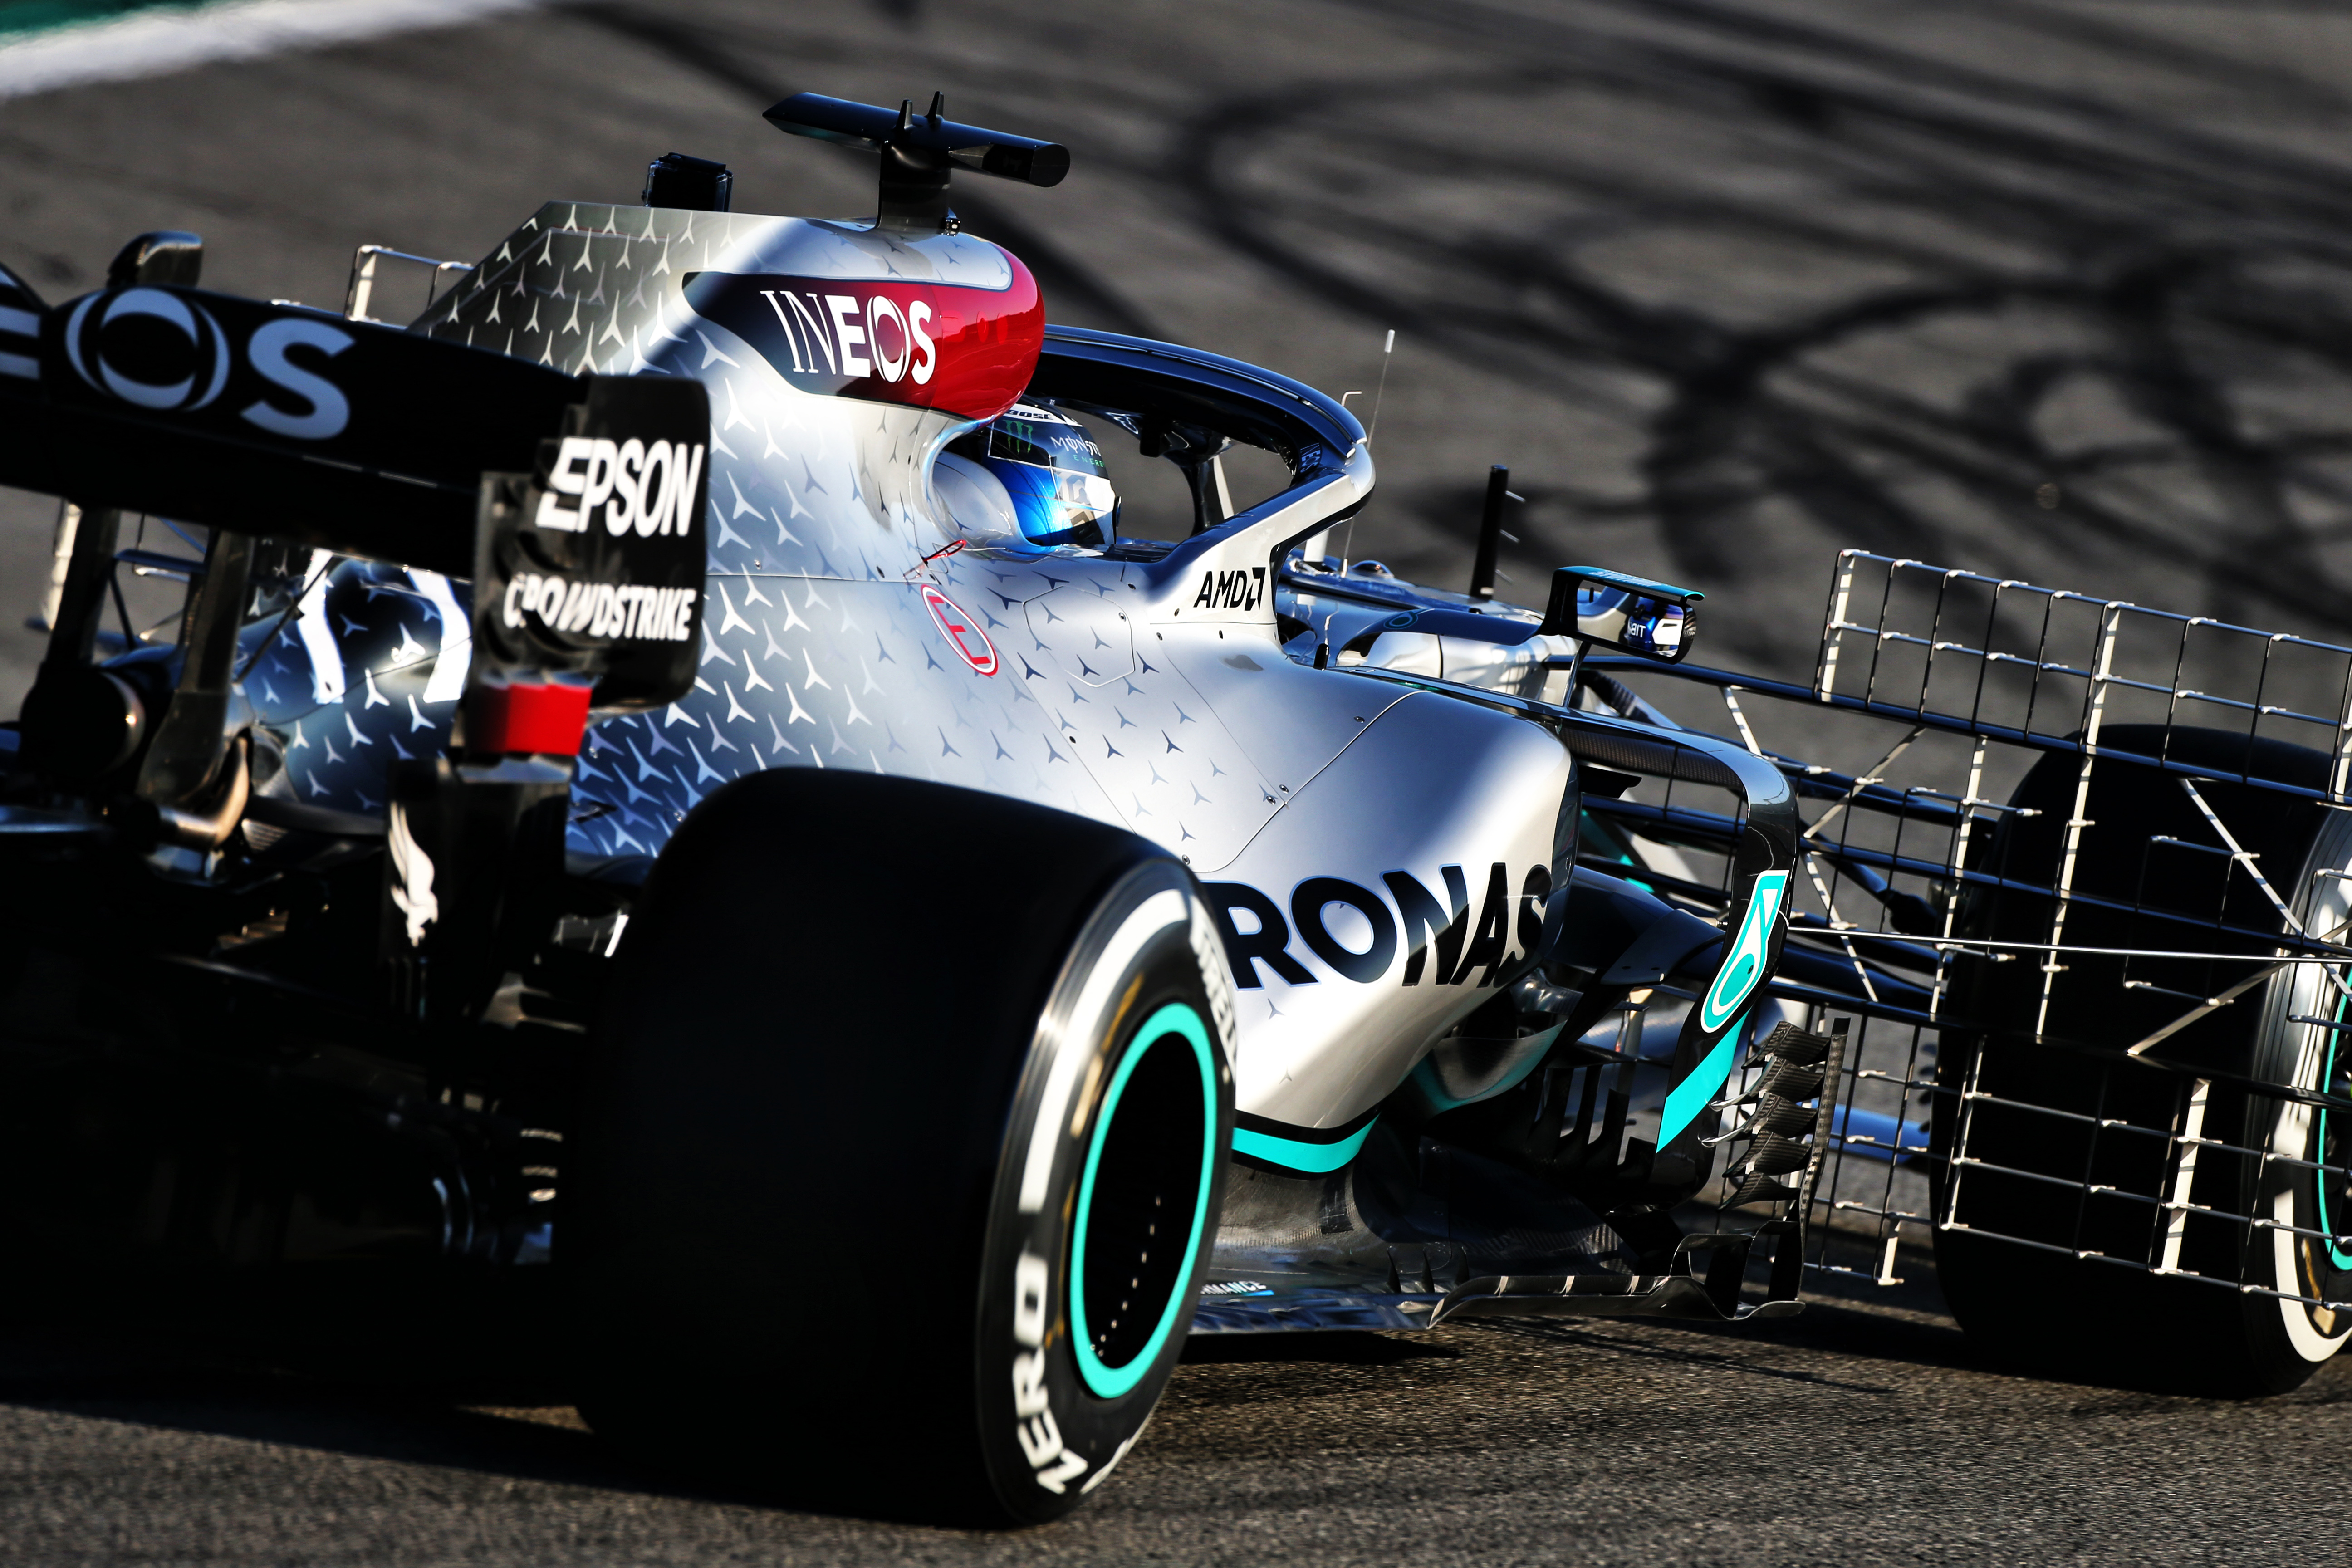 Motor Racing Formula One Testing Test One Day 1 Barcelona, Spain